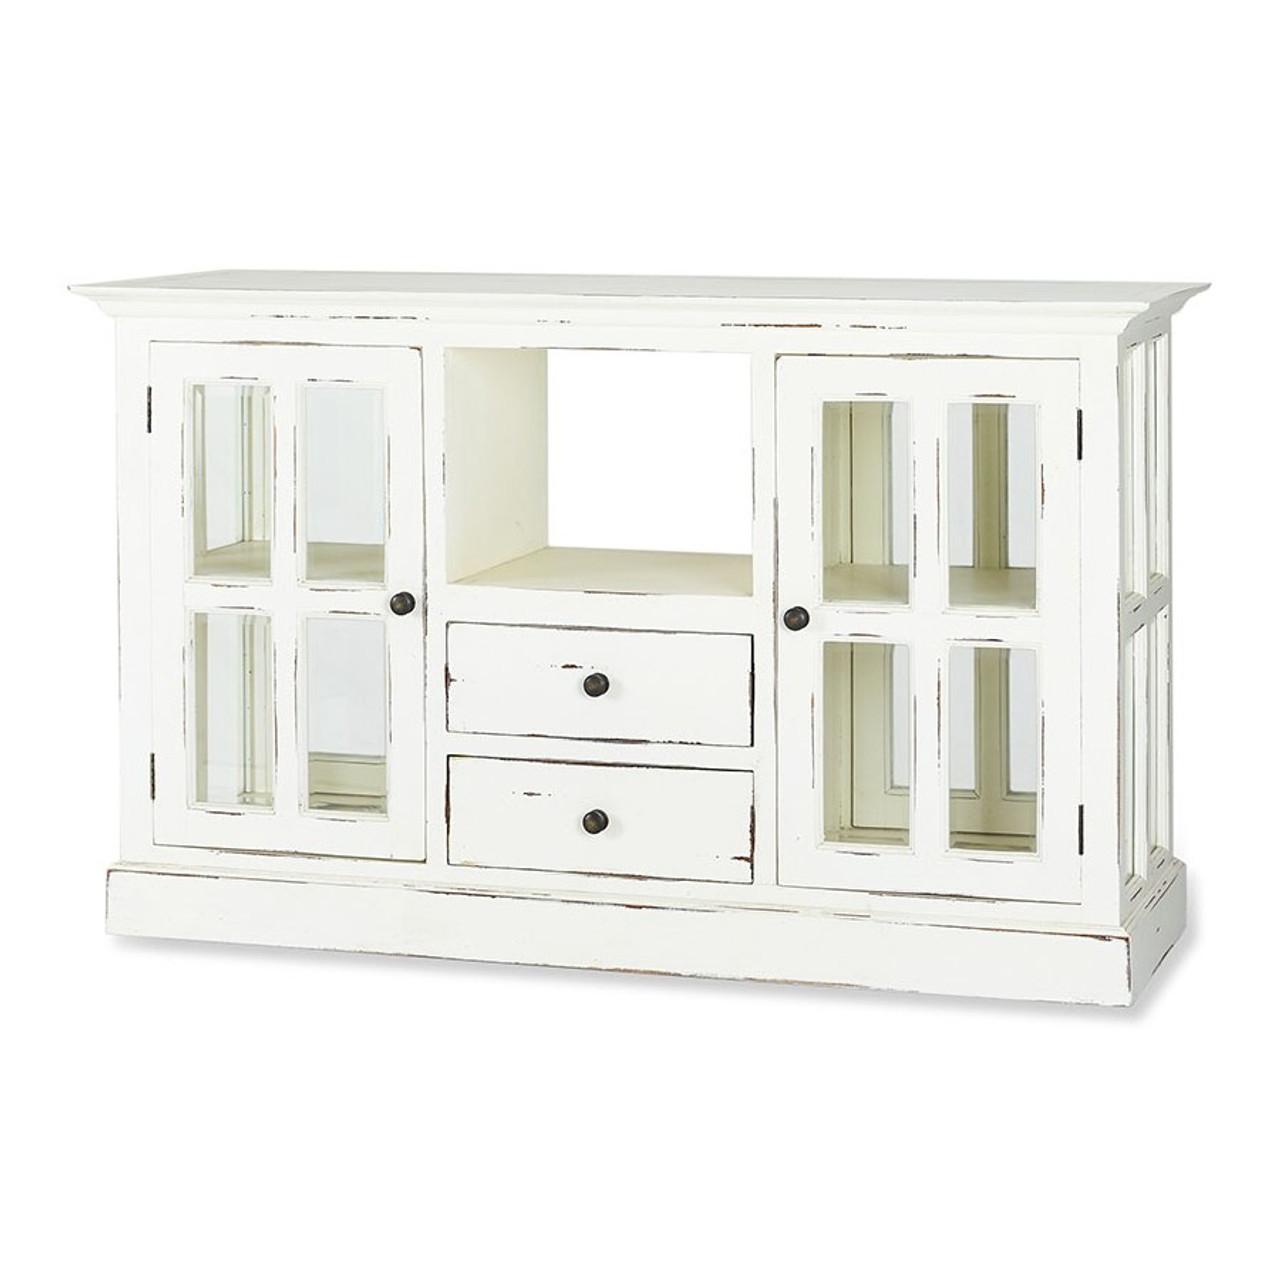 Cape Cod Kitchen Island W Wood Top Size 90h X 150w X 55d Cm Furniture Kitchen Kitchen Island Bar